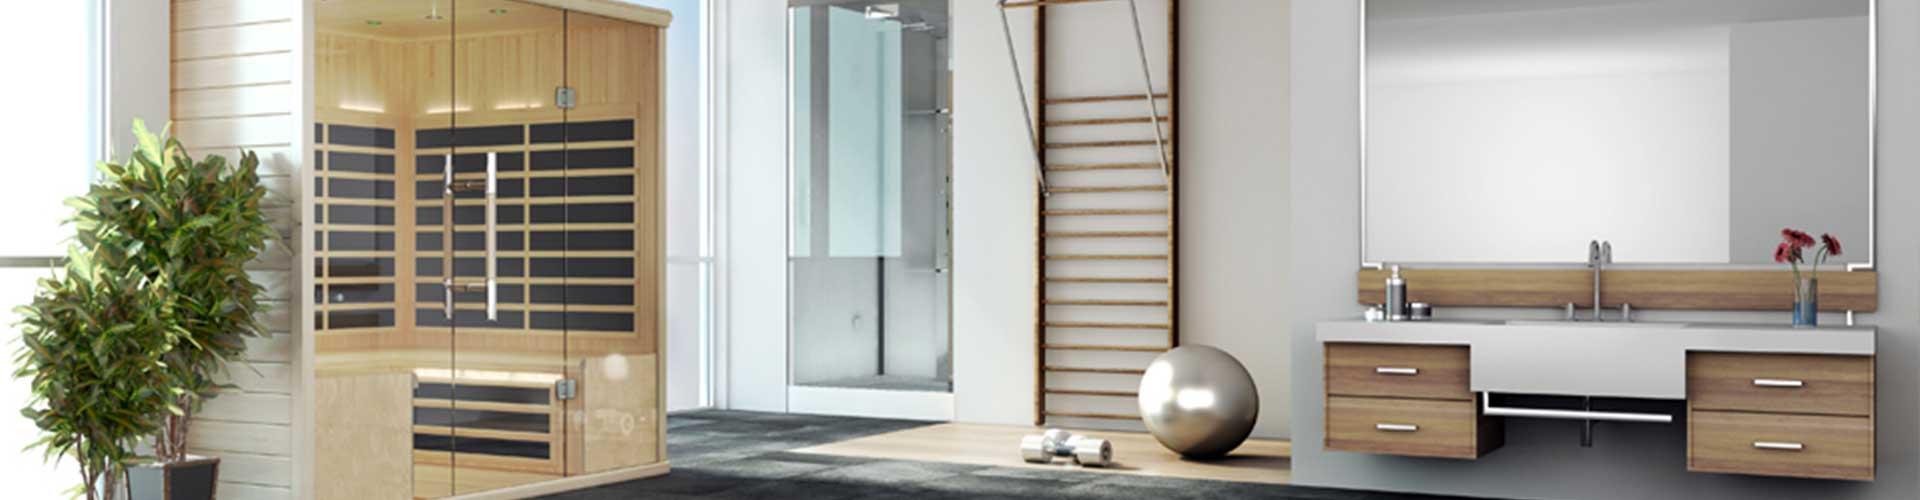 Stress Management Made Easy in a Home Sauna, Burnsville Sauna Sale